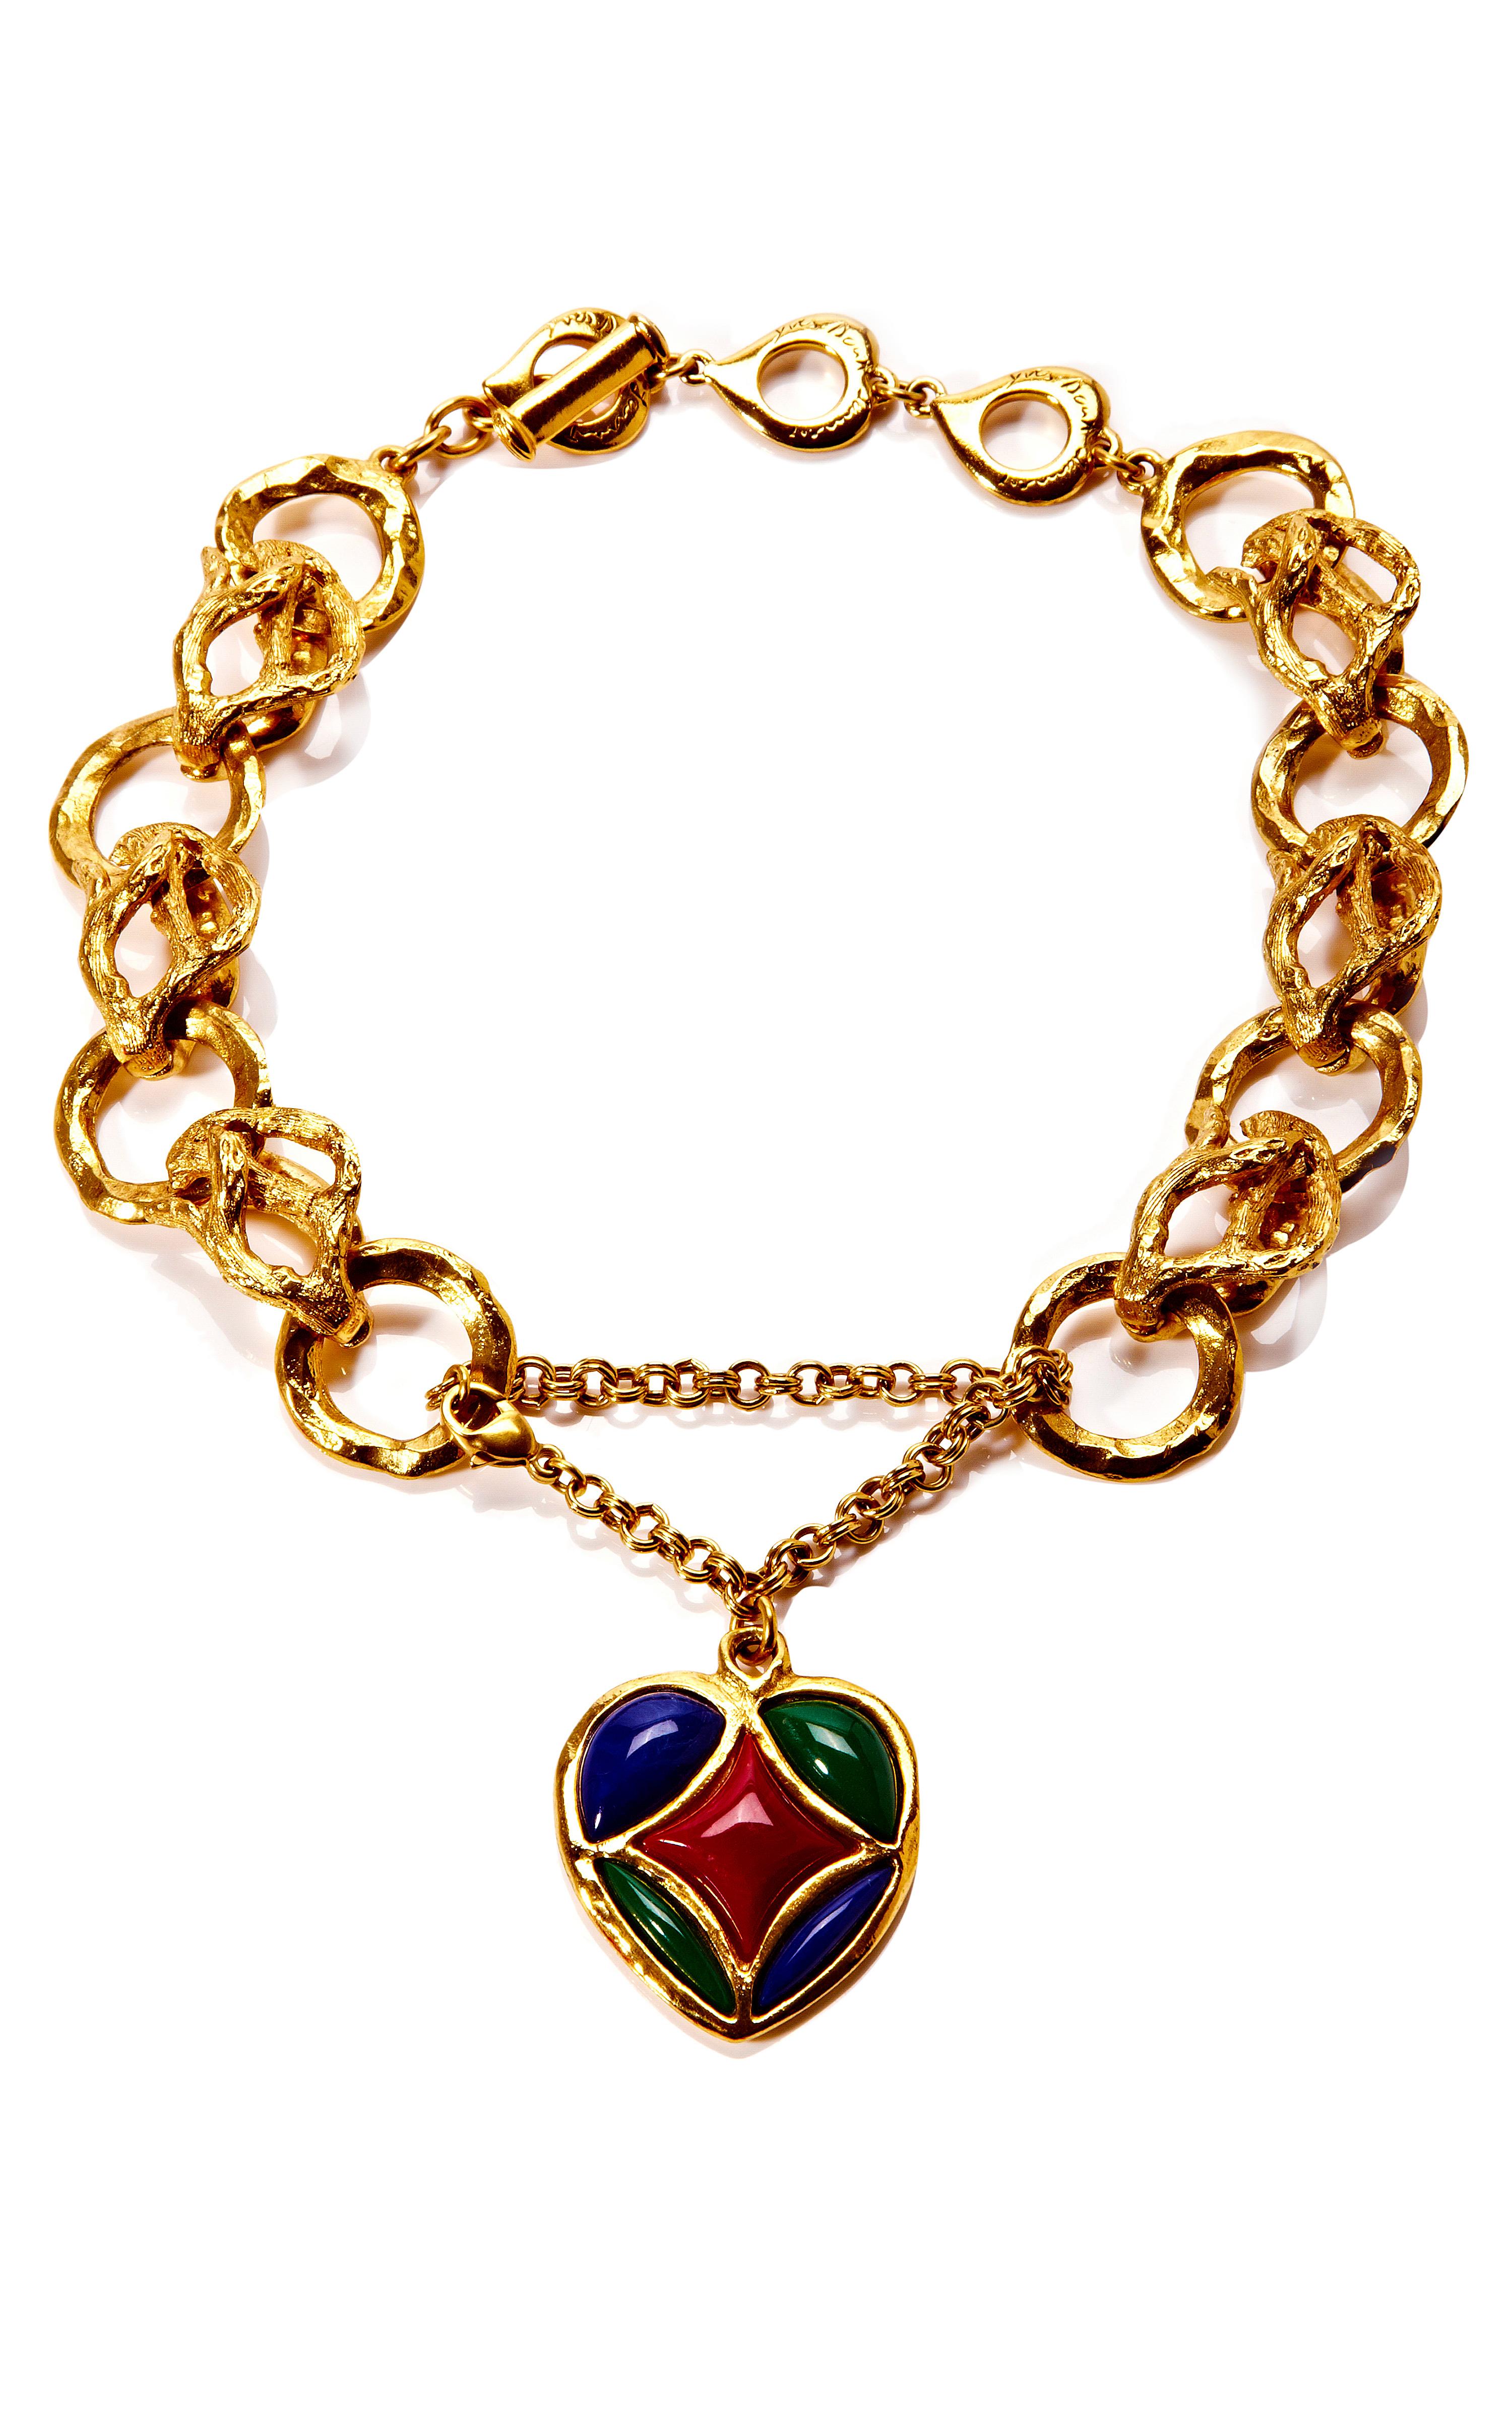 5976af12bff86f House of Lavande Domont Yves Saint Laurent Gold Chain Link Necklace ...